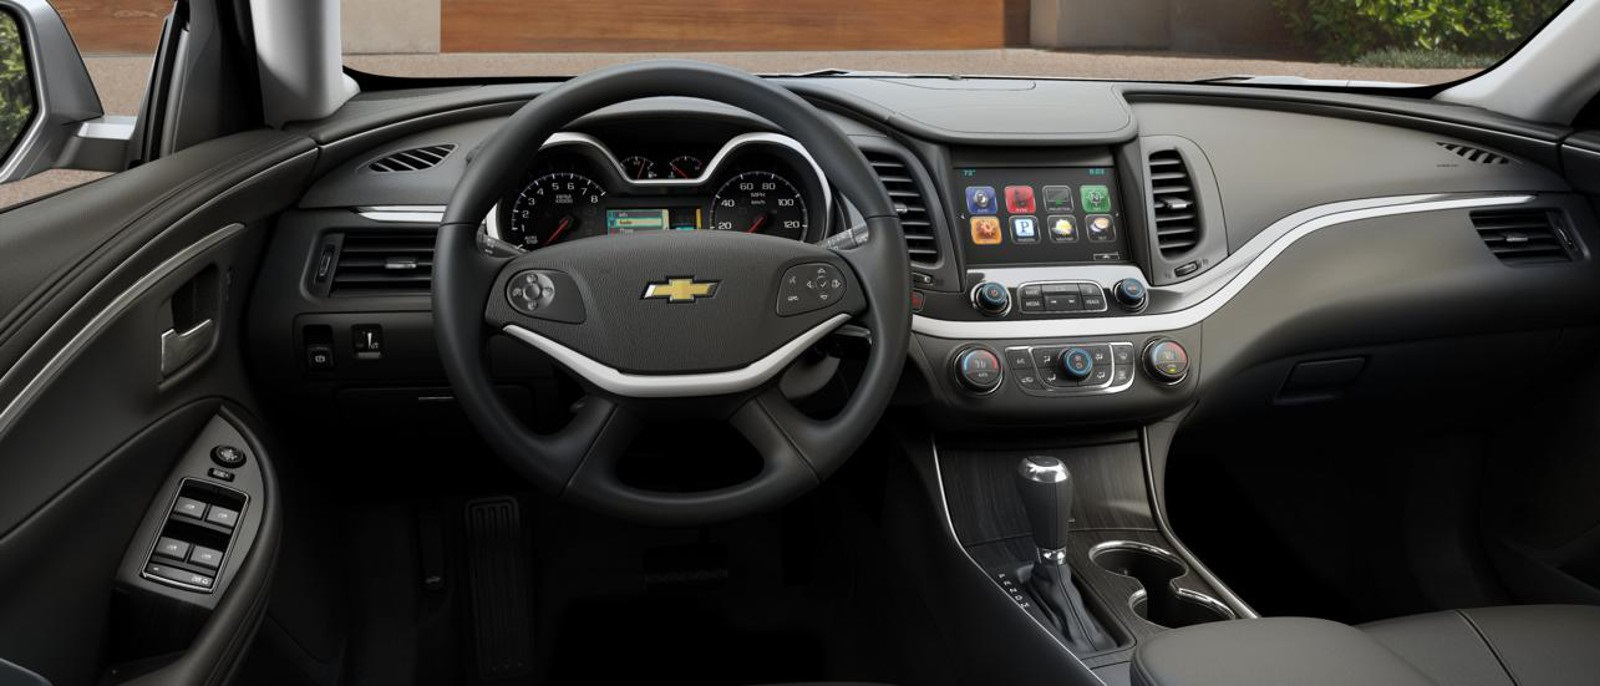 2014 Chevrolet Malibu TSBs Technical Service Bulletins